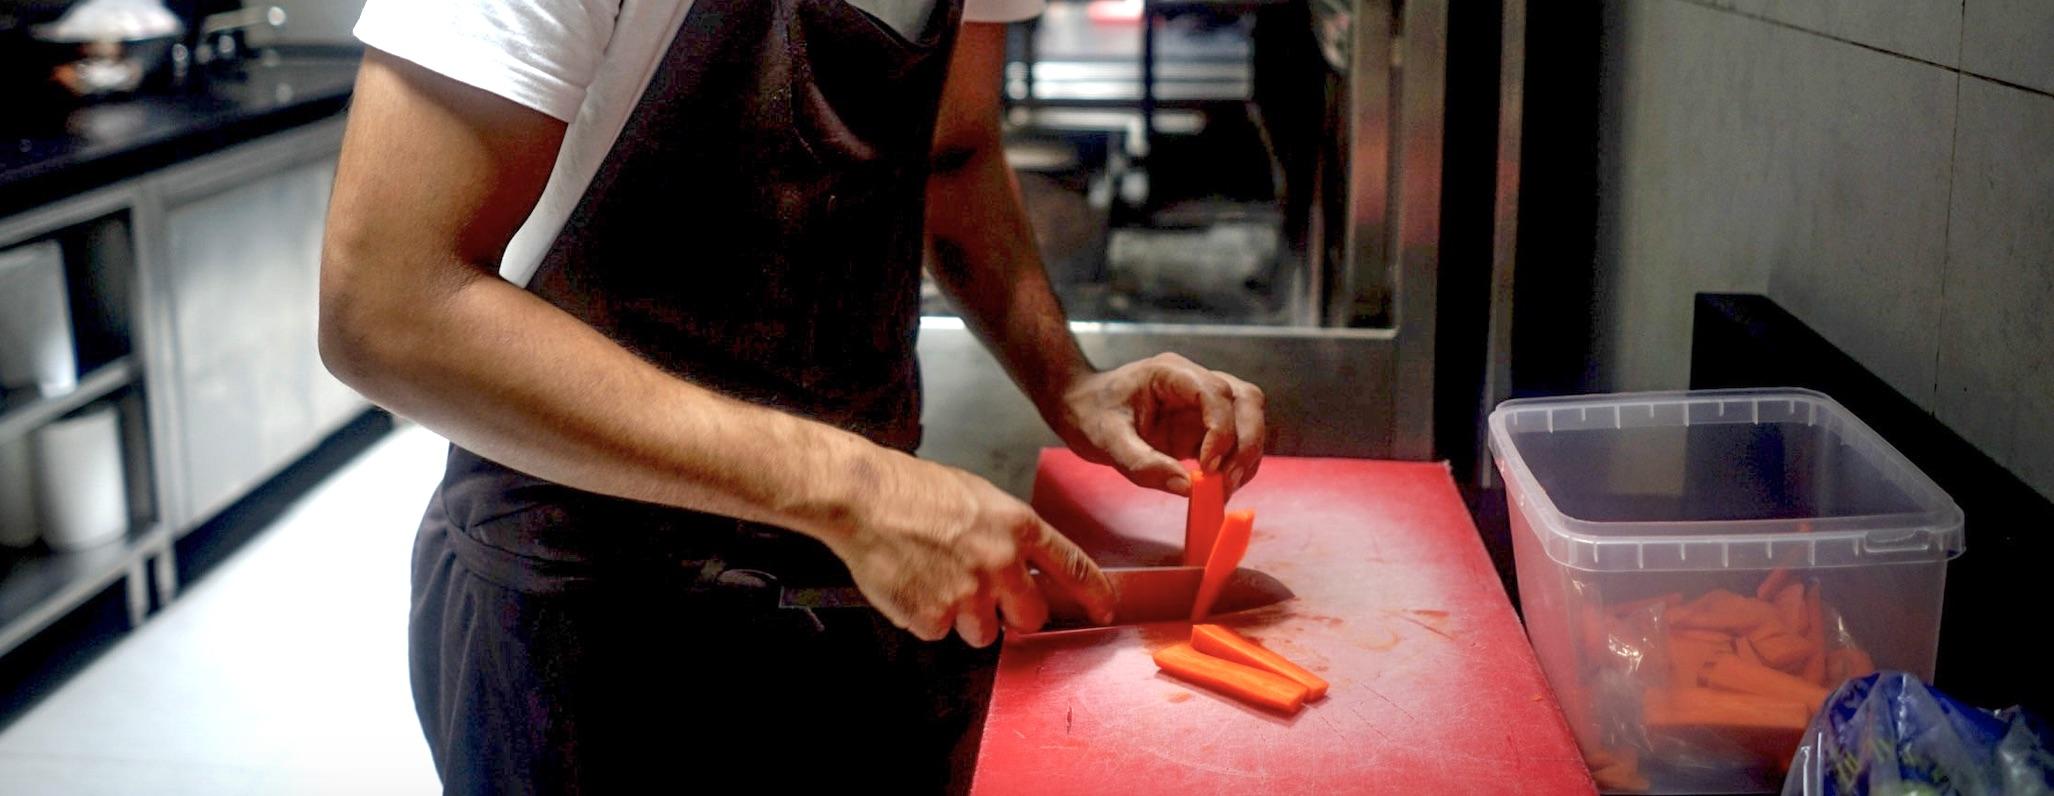 Chopping Carrots Image.jpg